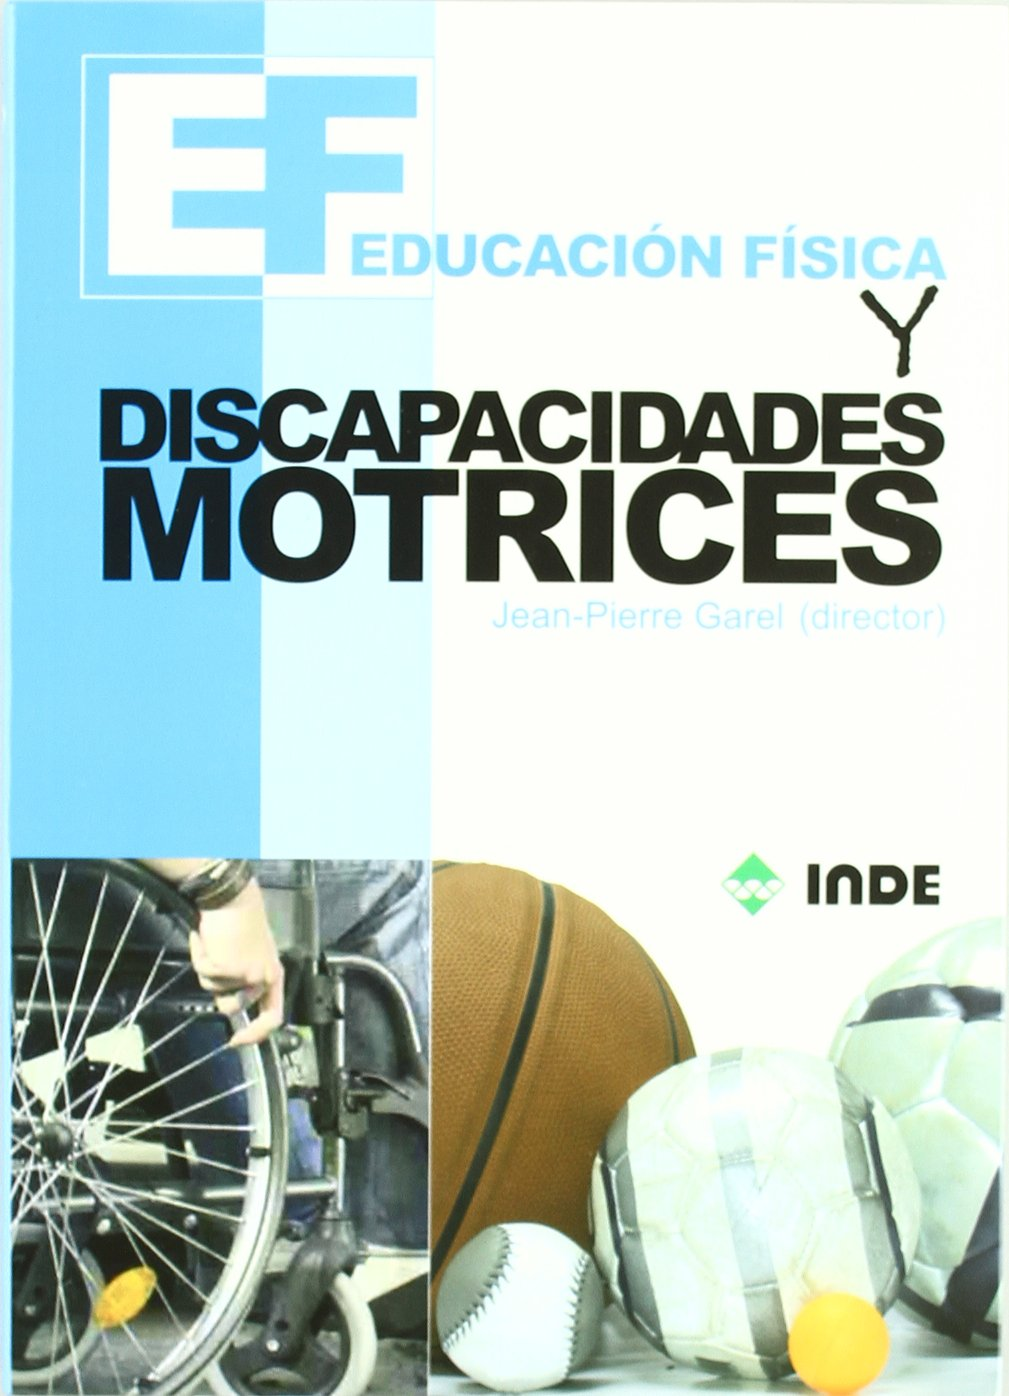 Educacion Fisica y Discapacidades Motrices (Spanish) Paperback – 2014